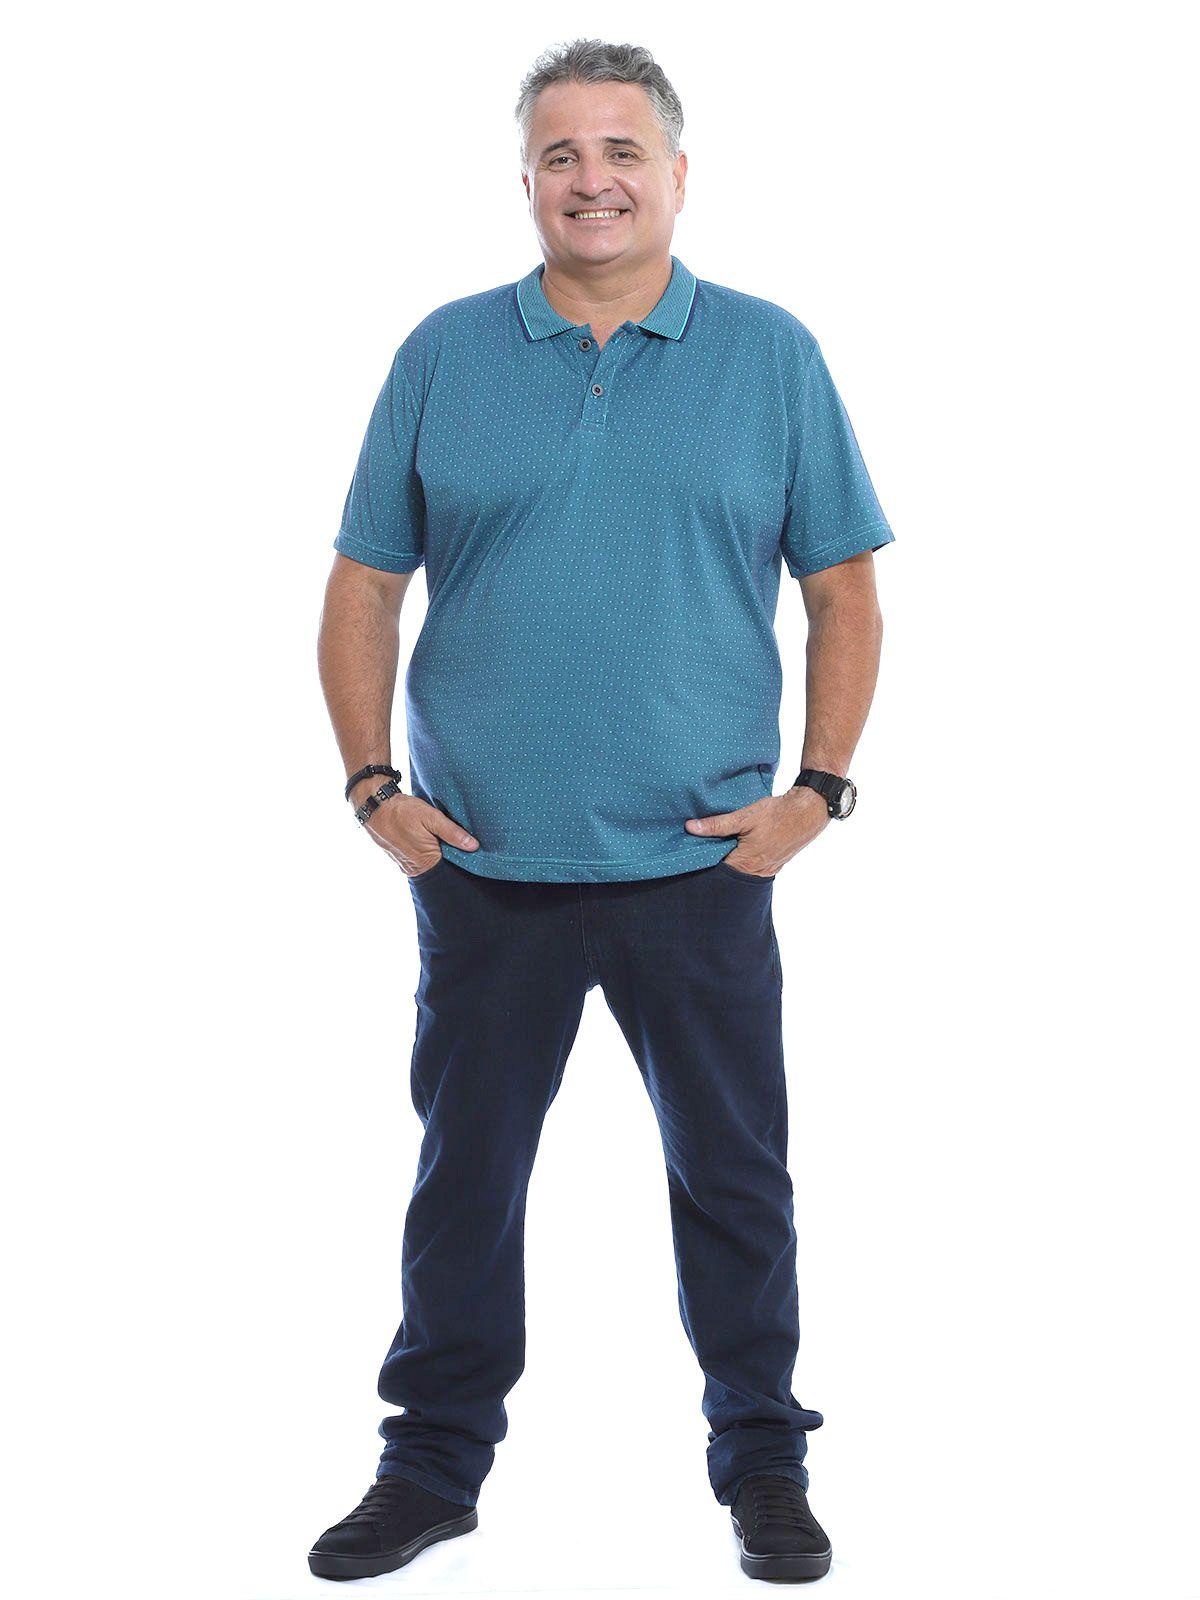 Camisa Polo Plus Size Jacquard Regente Azul Jeans